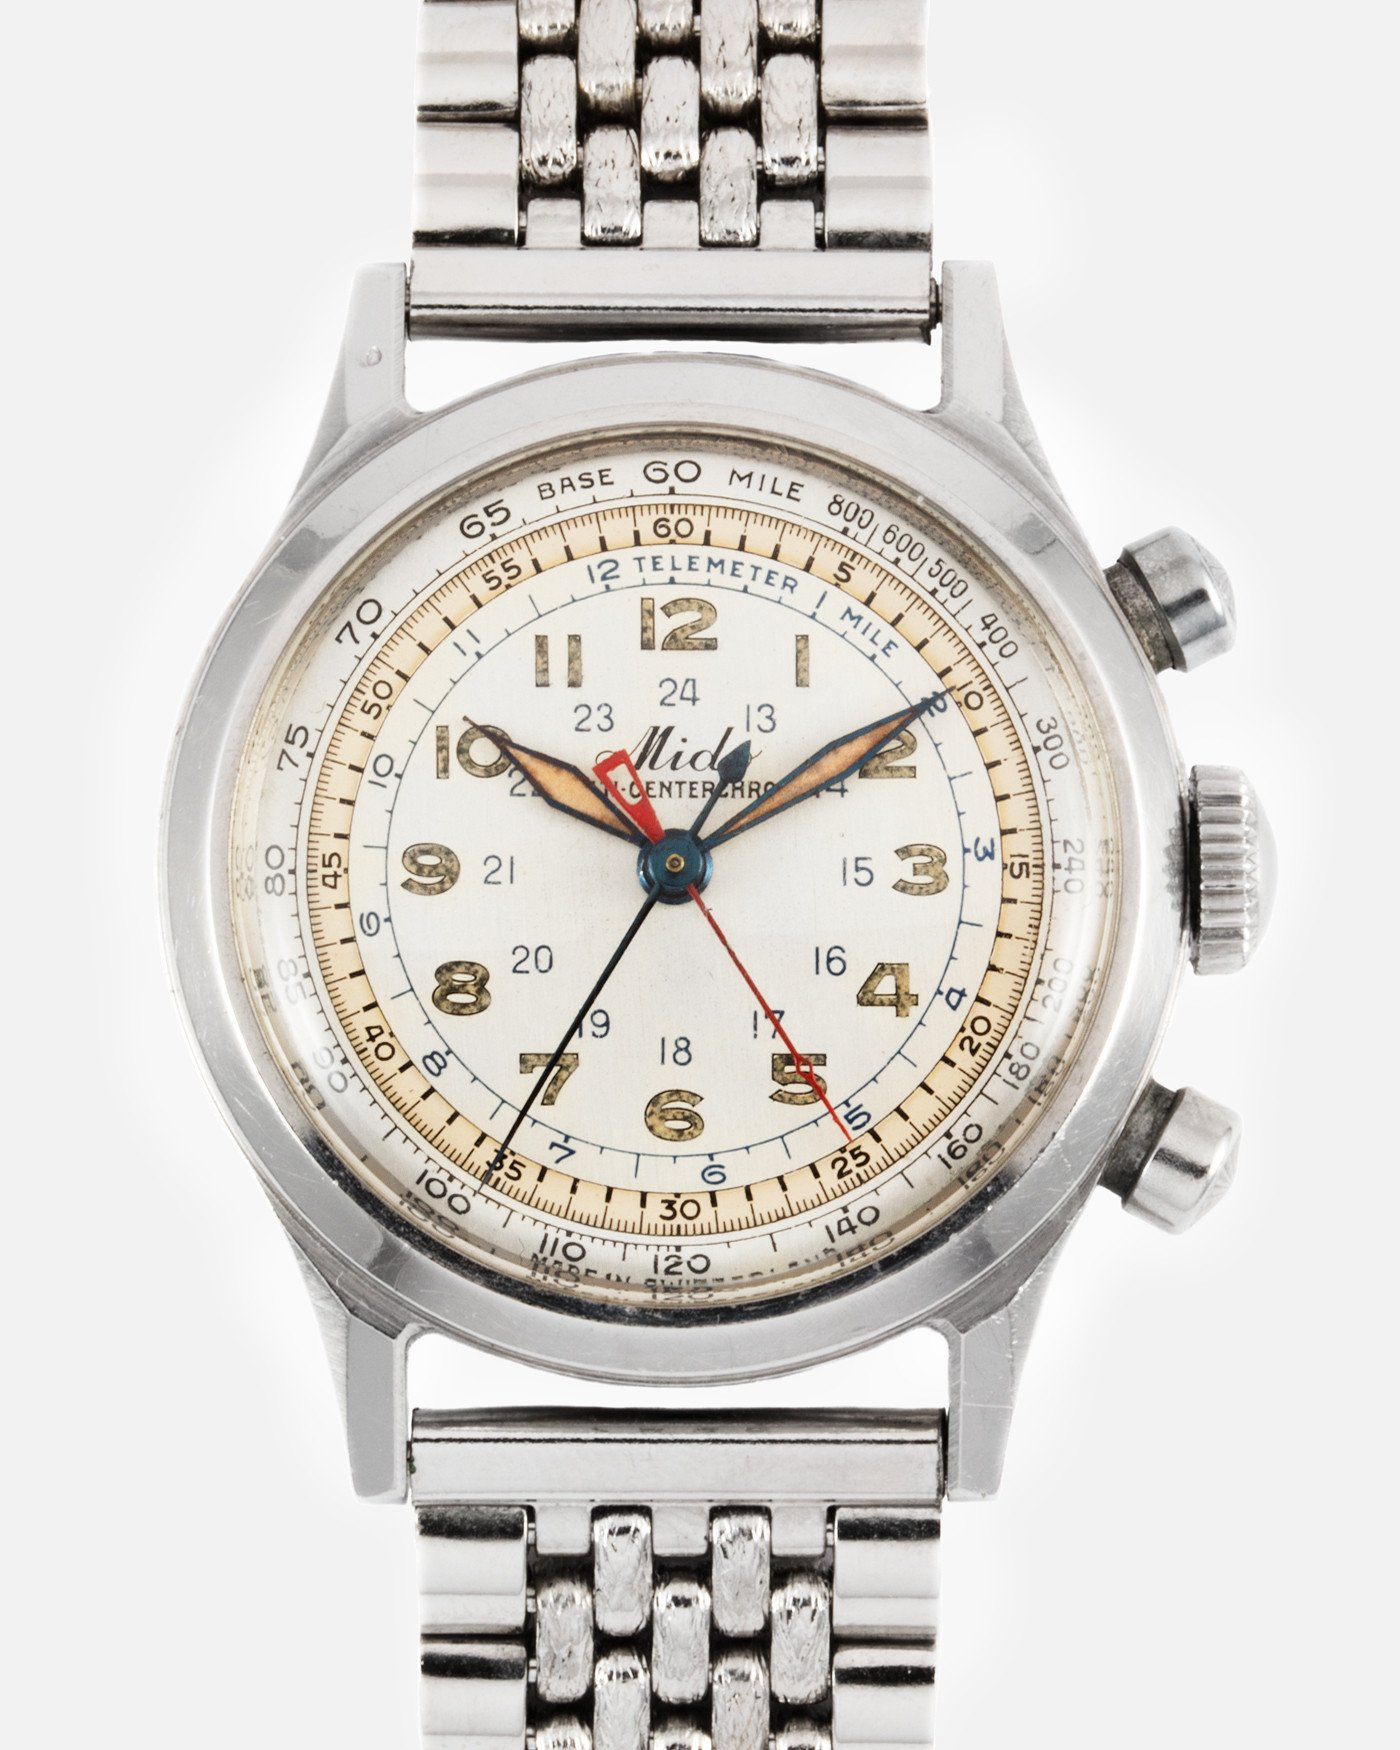 Mido Multi Centerchrono central stack chronograph vintage